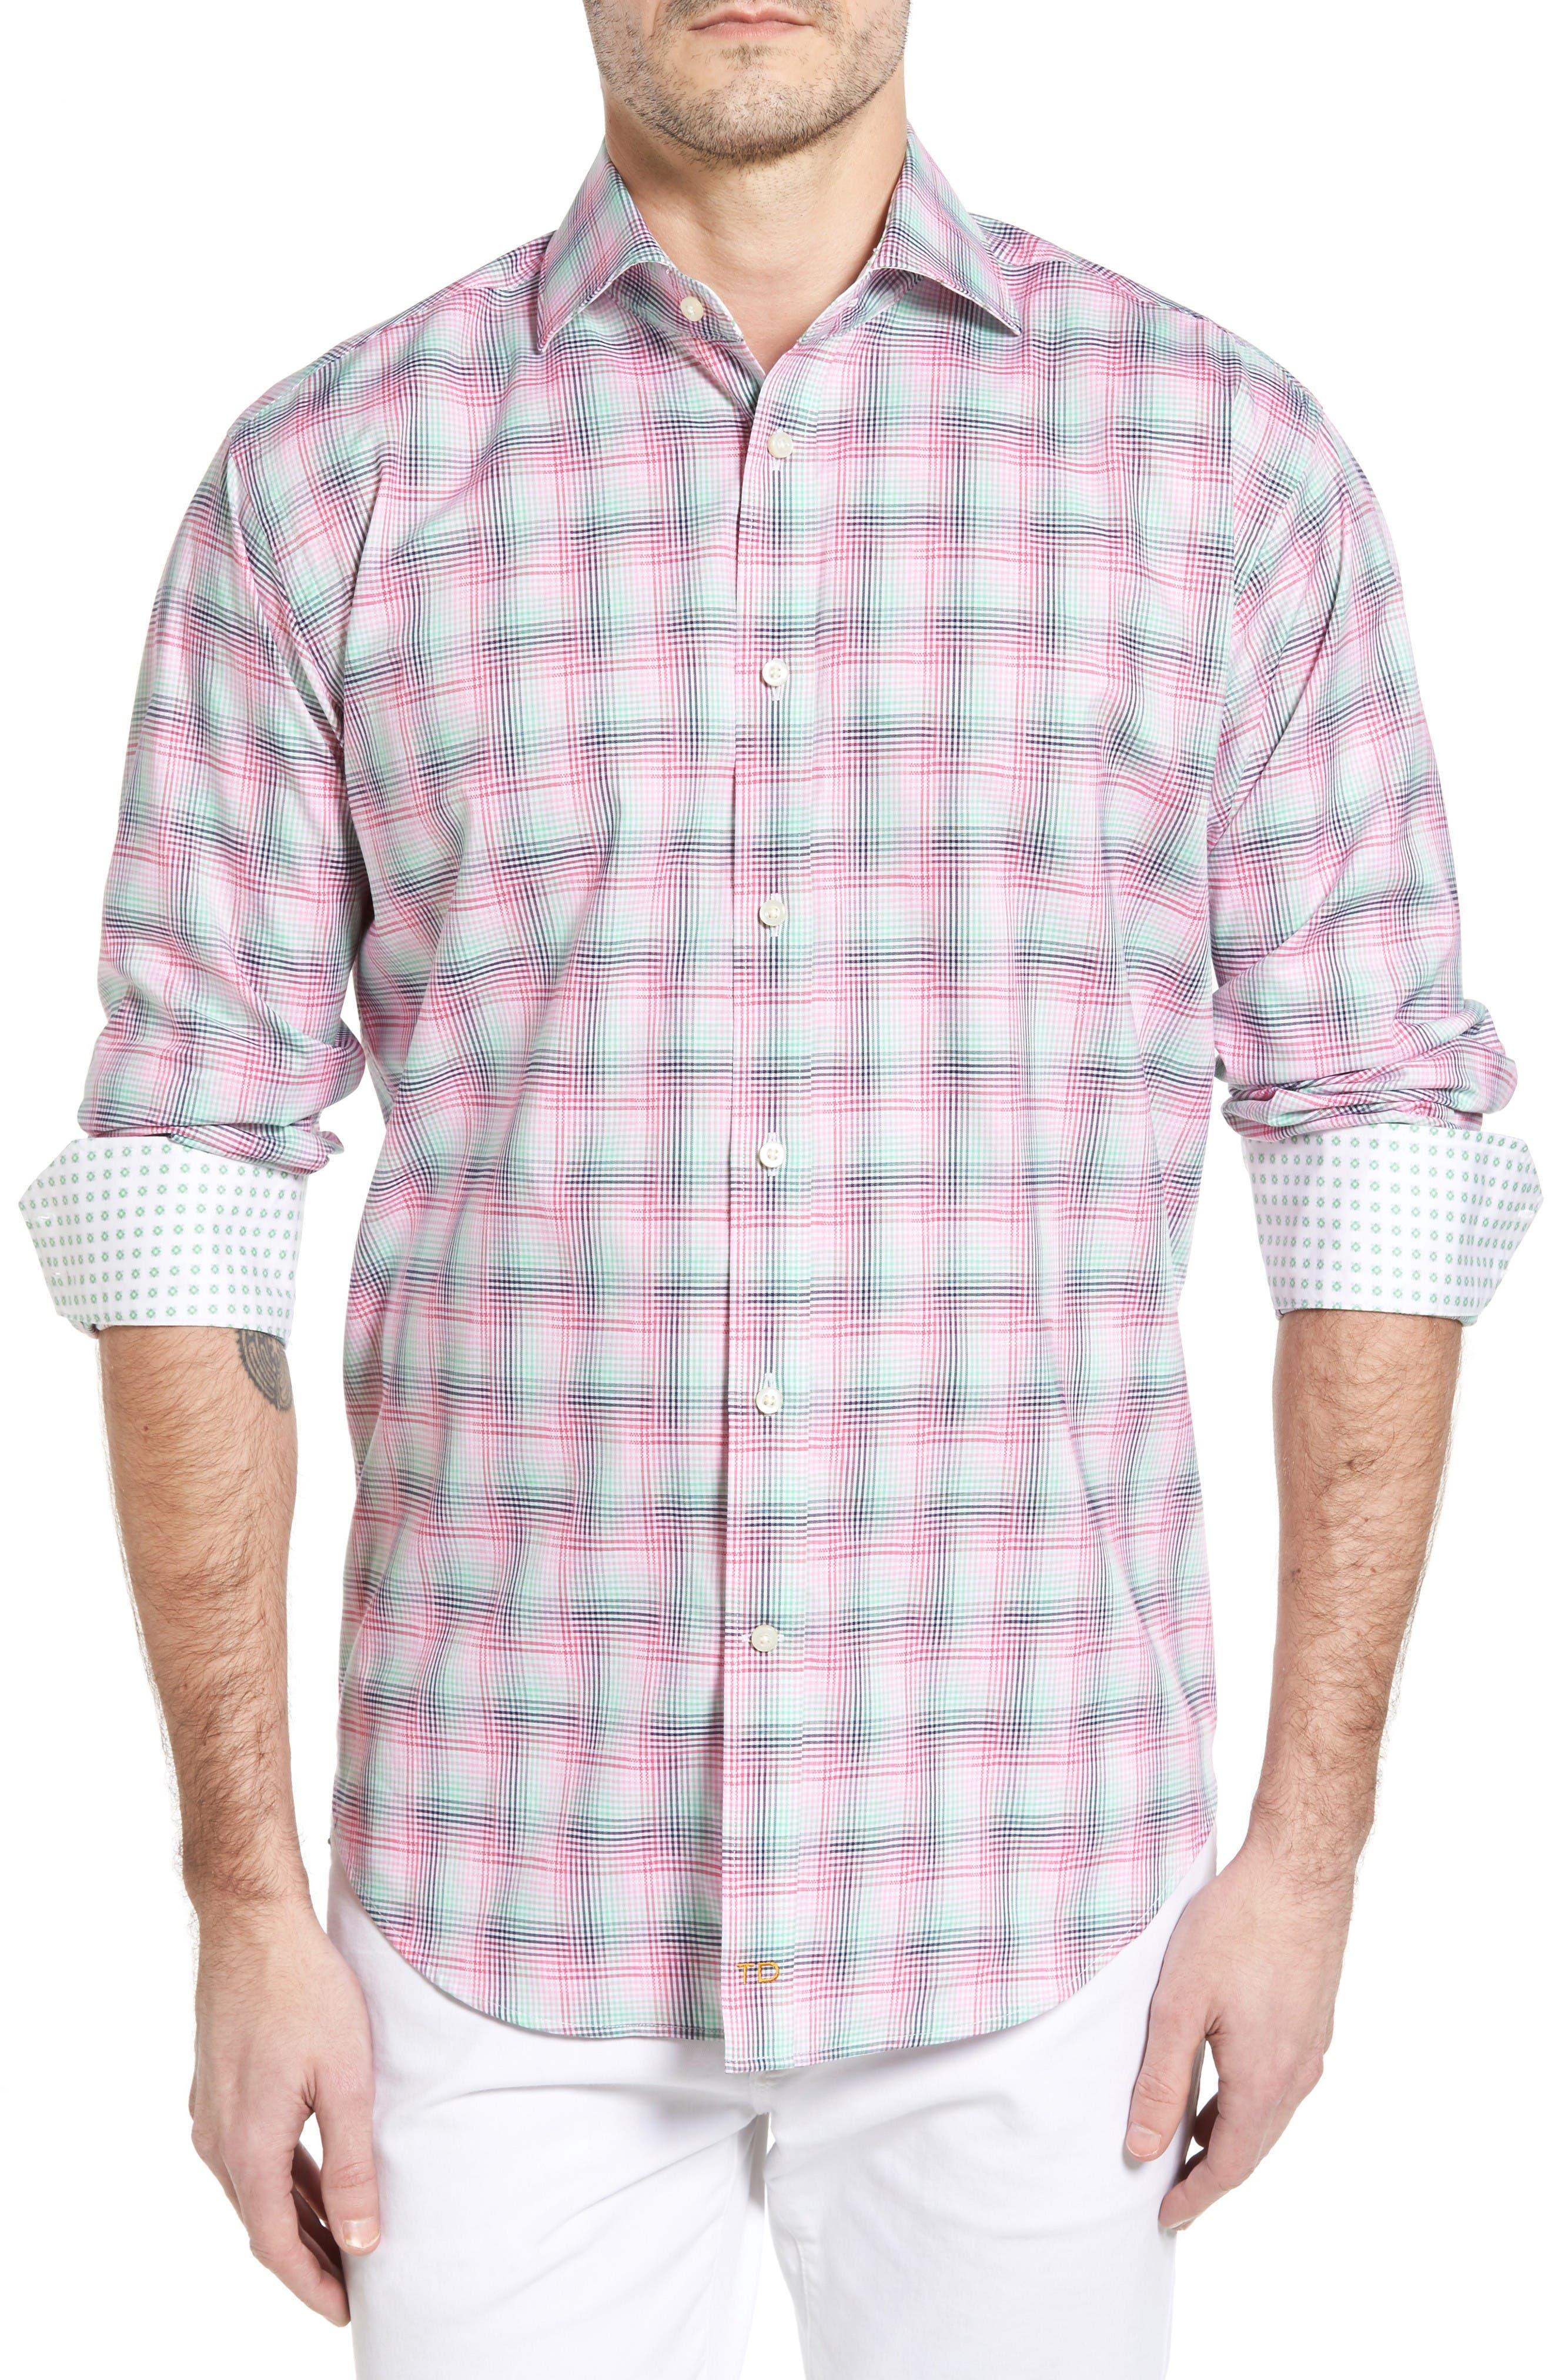 Main Image - Thomas Dean Classic Fit Funky Plaid Sport Shirt (Regular)